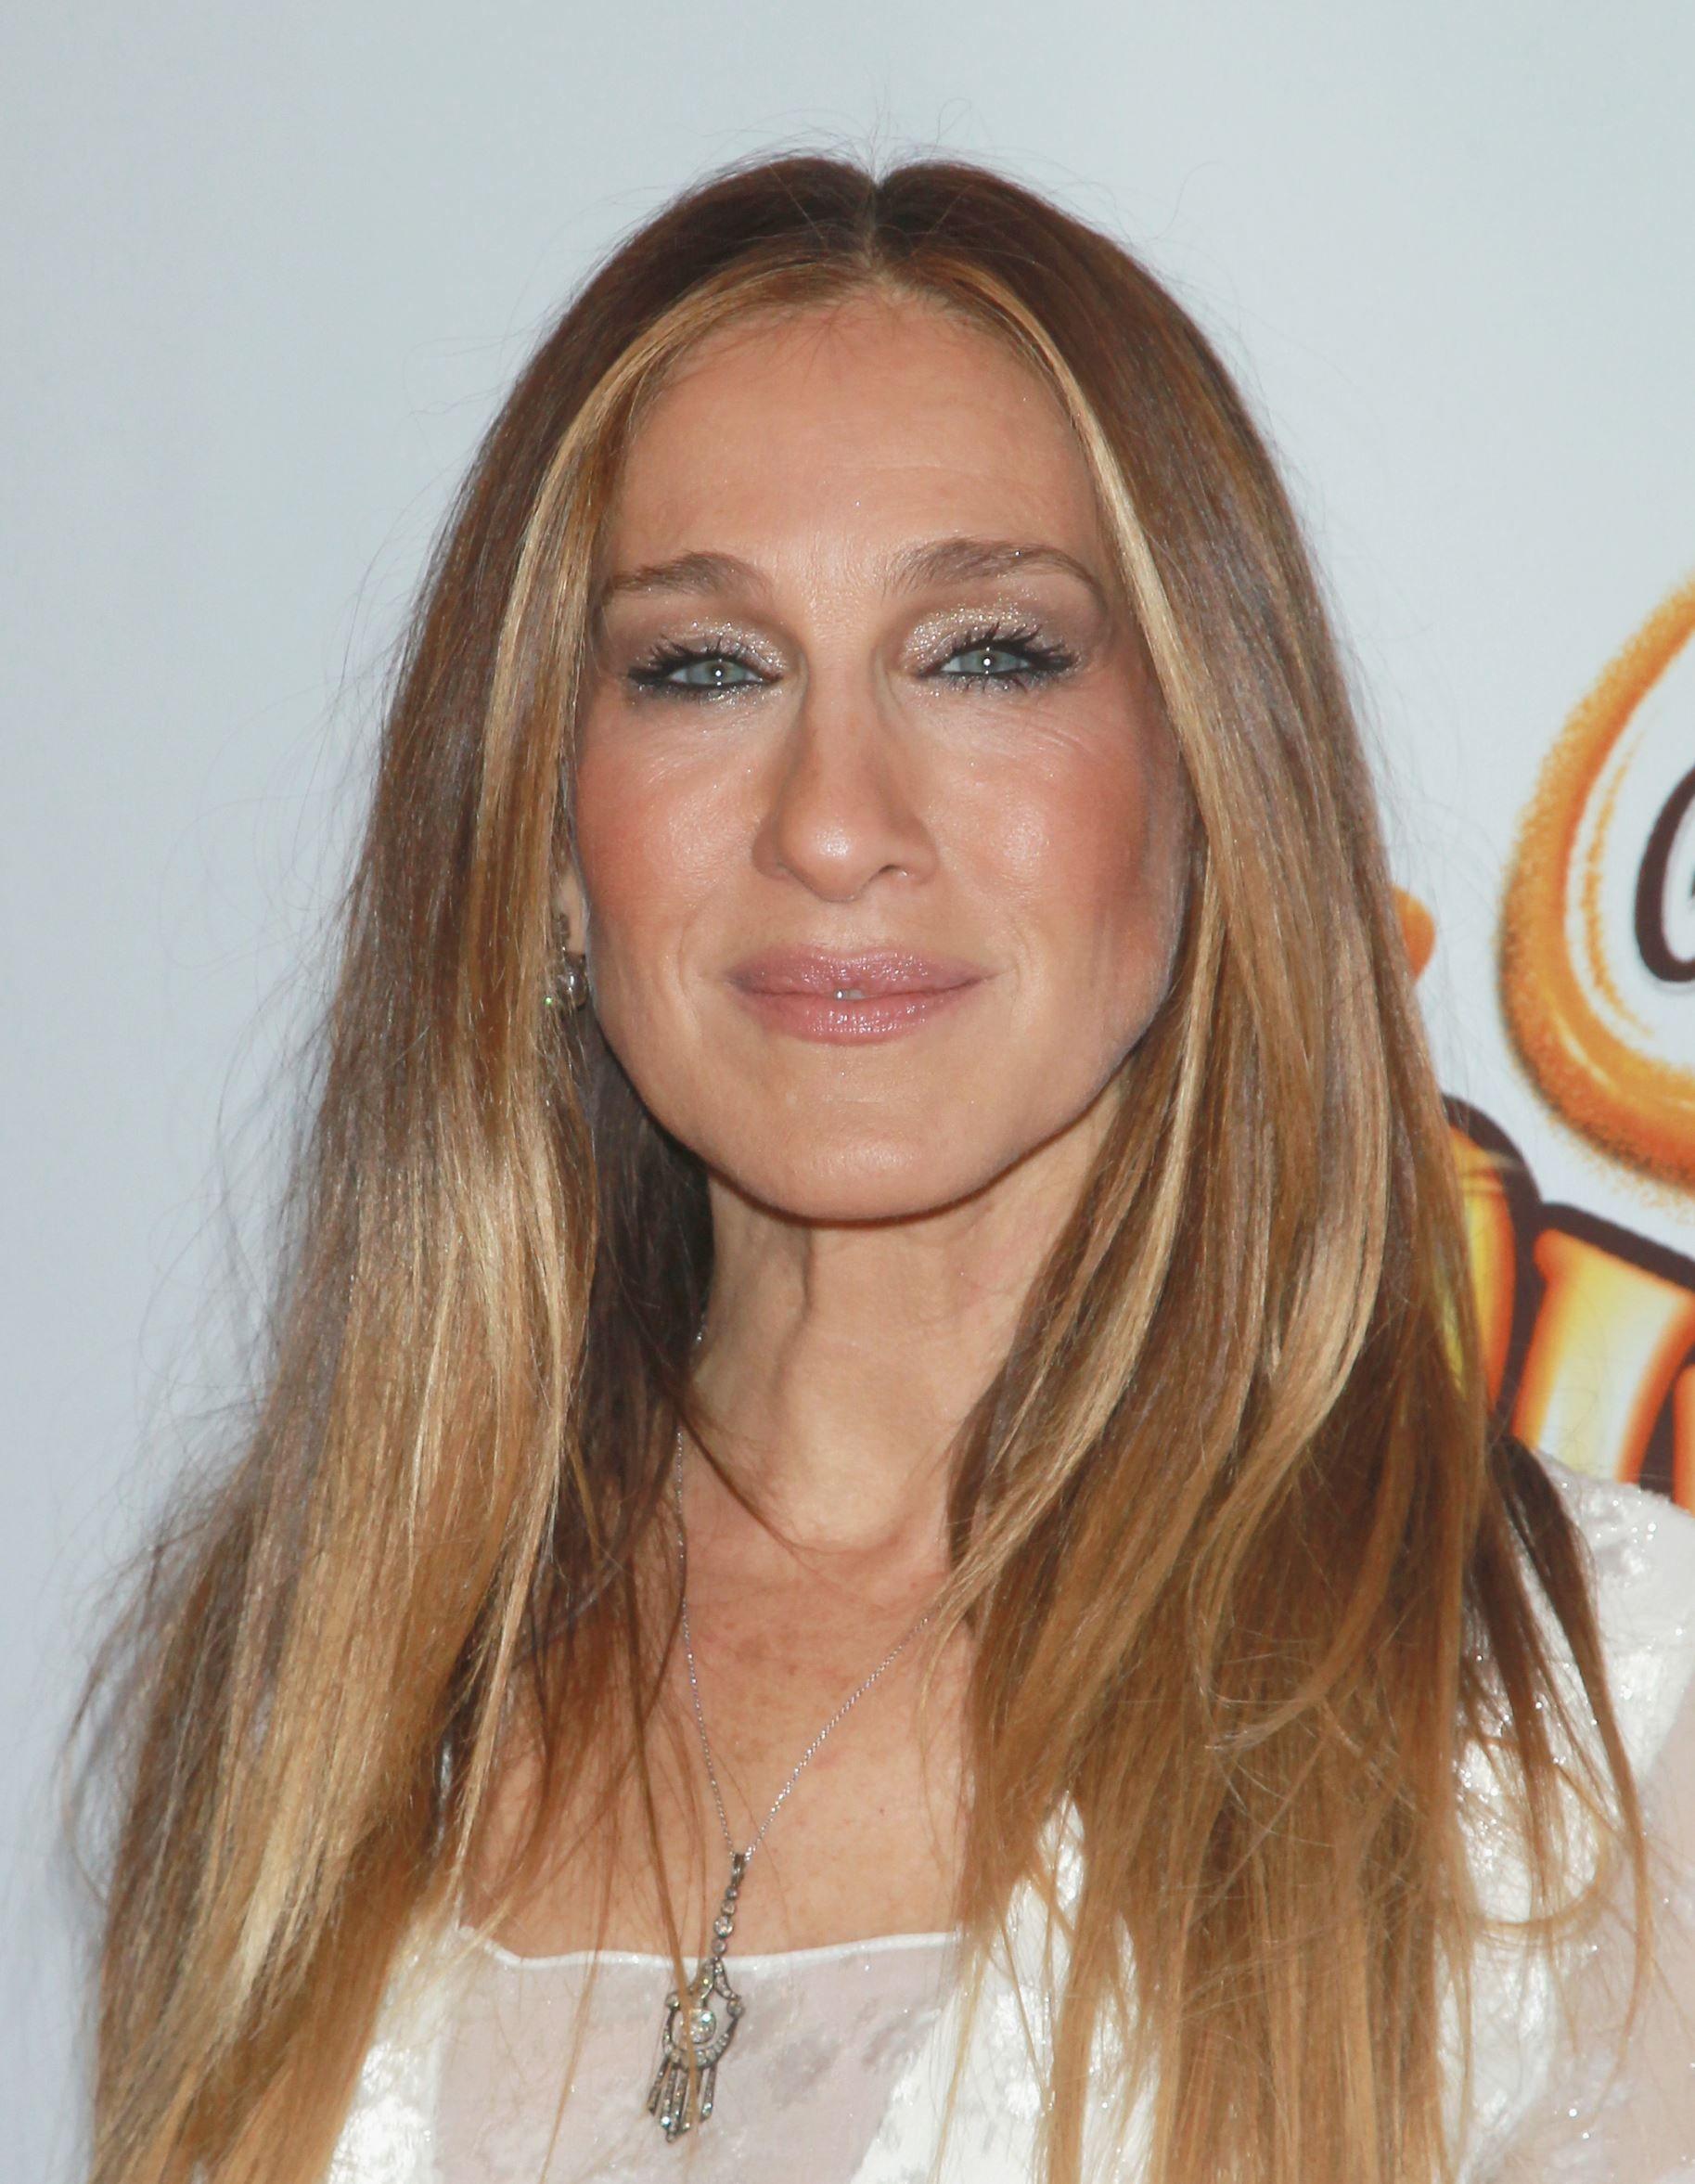 10 Makeup Mistakes Even Celebrities Make